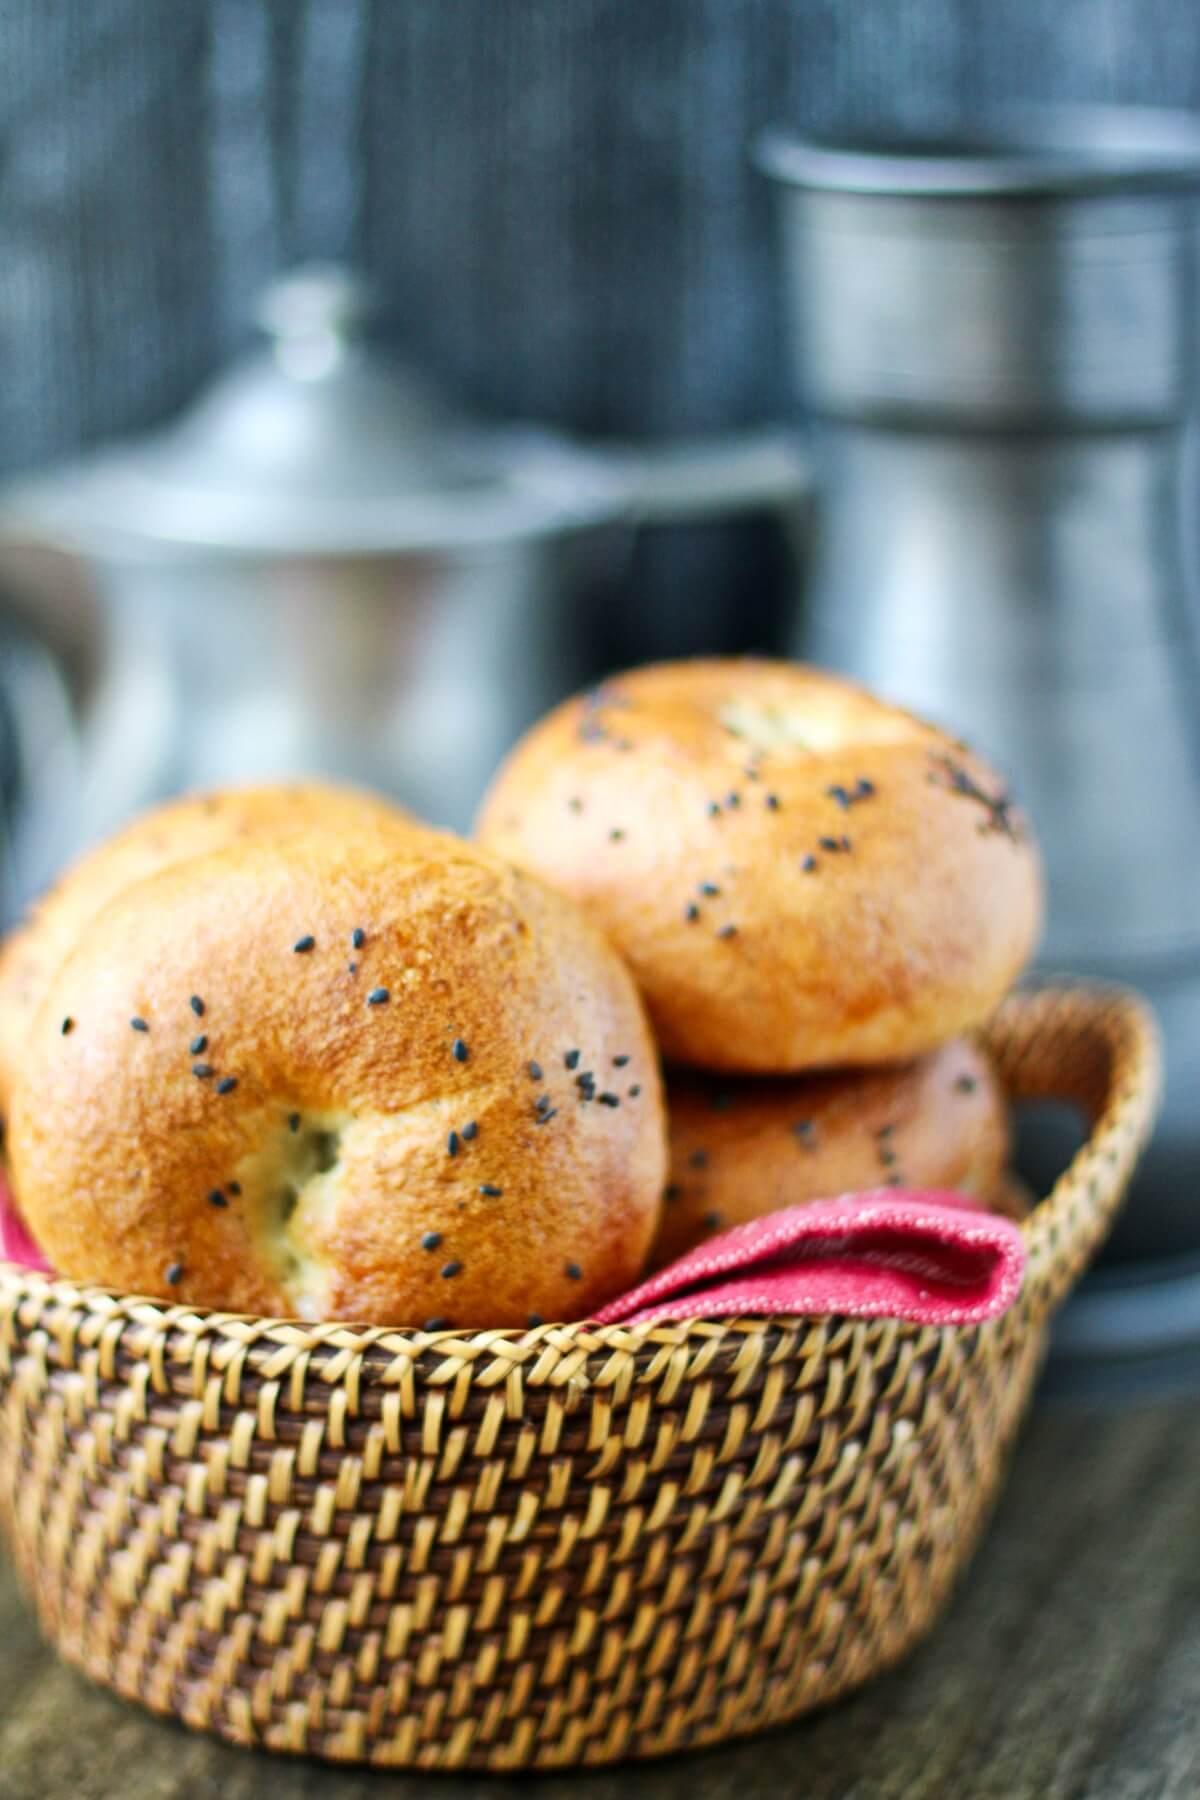 Bagels in a basket.